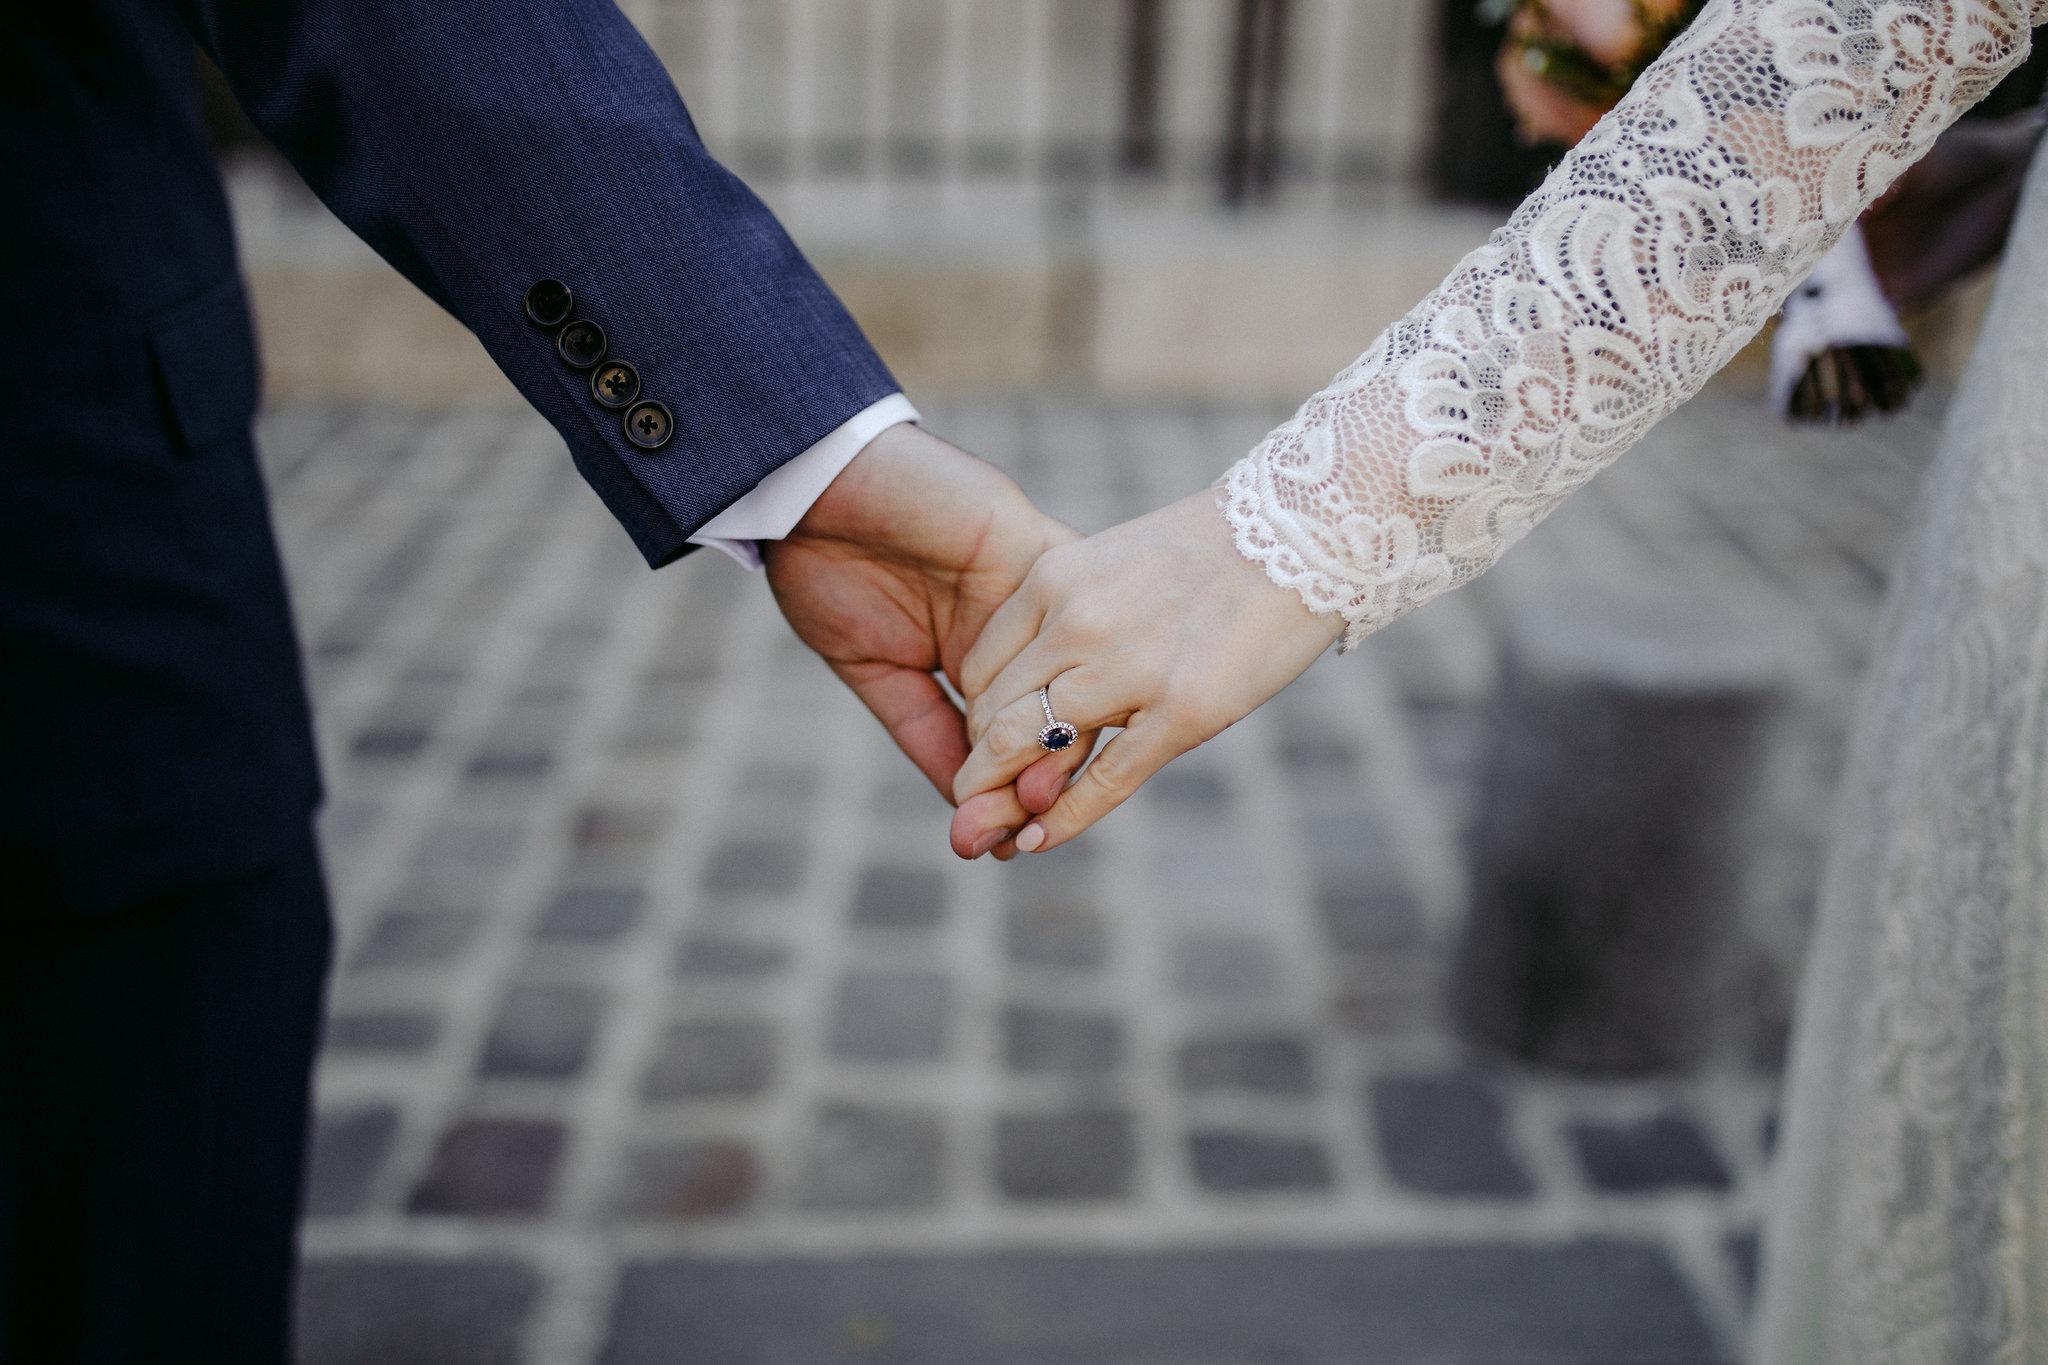 Paris_elopement_wedding_photographer-139.jpg